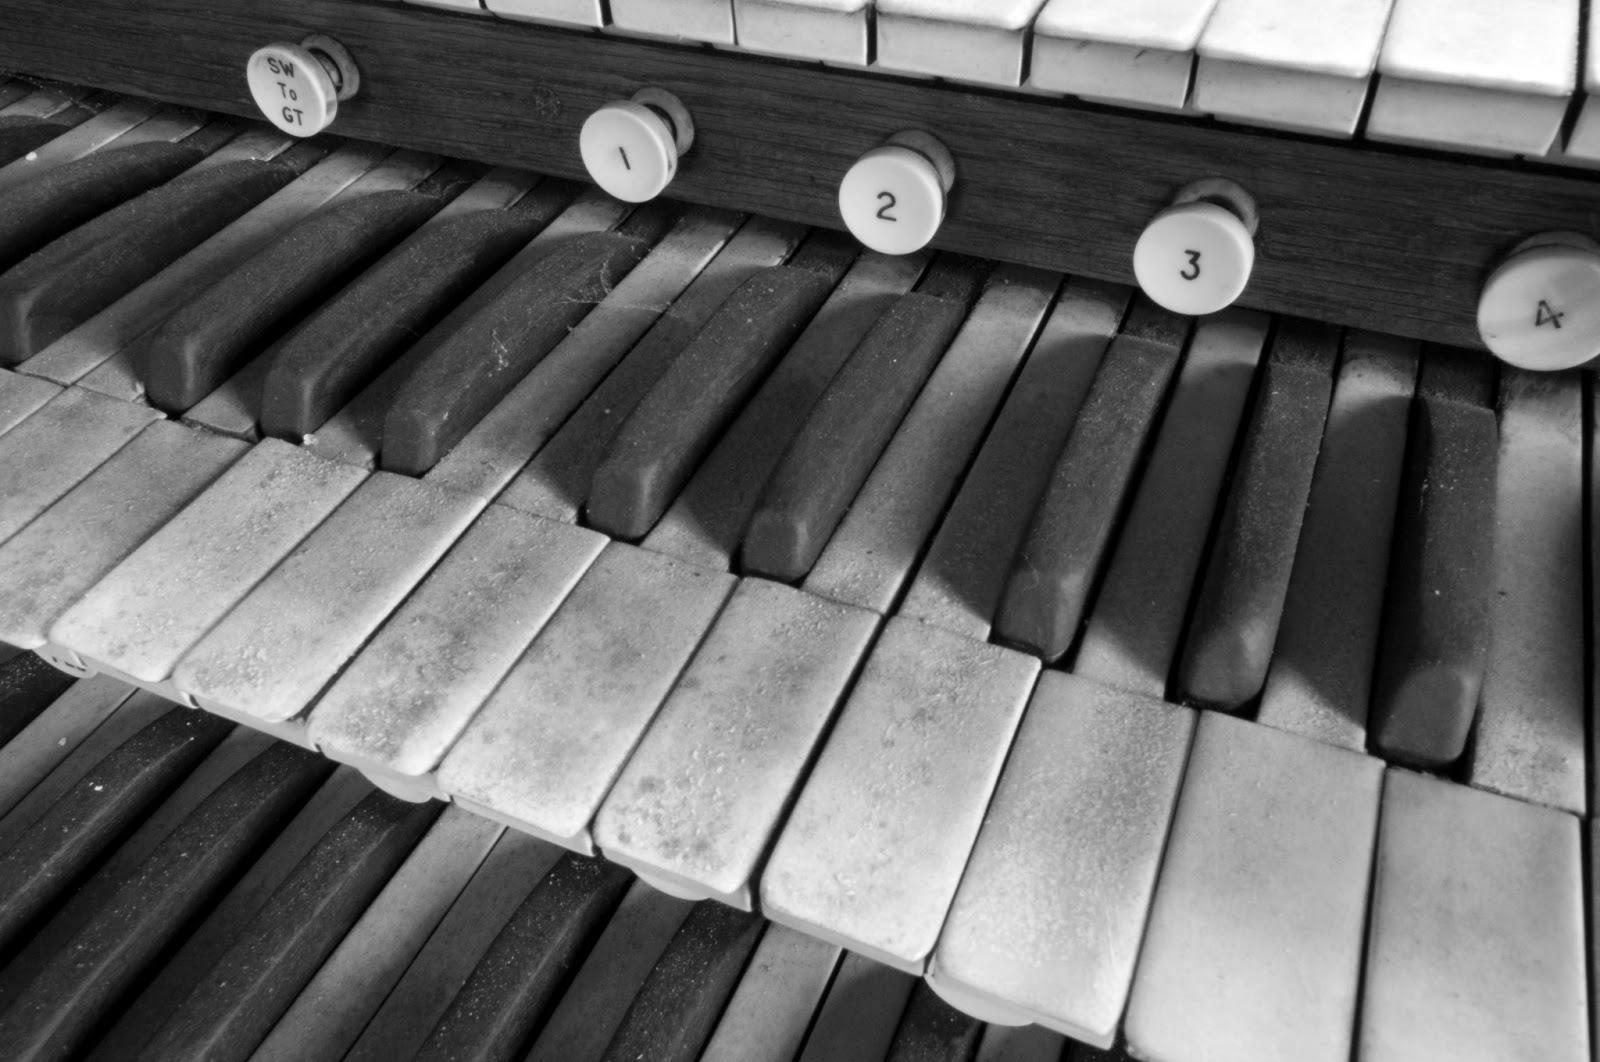 instruments keyboard wallpaper - photo #45